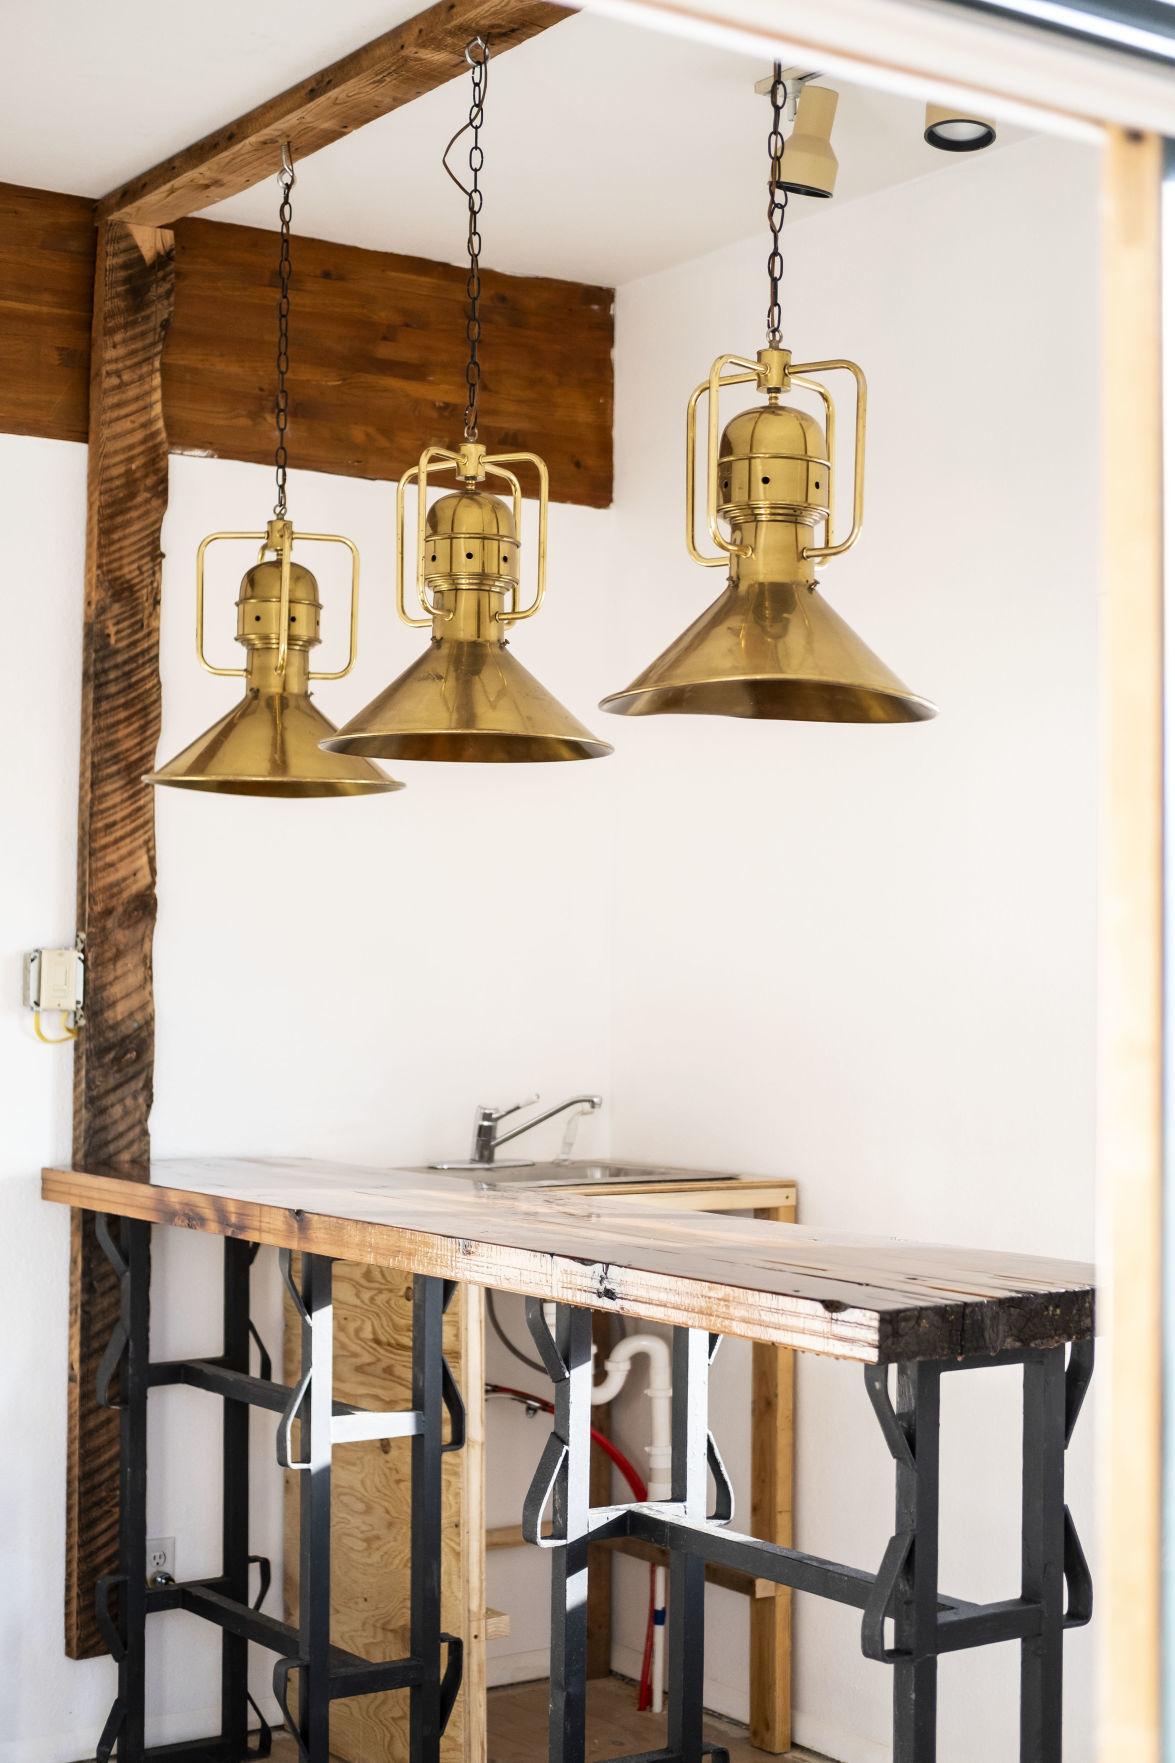 Farmstead Cider and Humble Brew Coffee tasting room